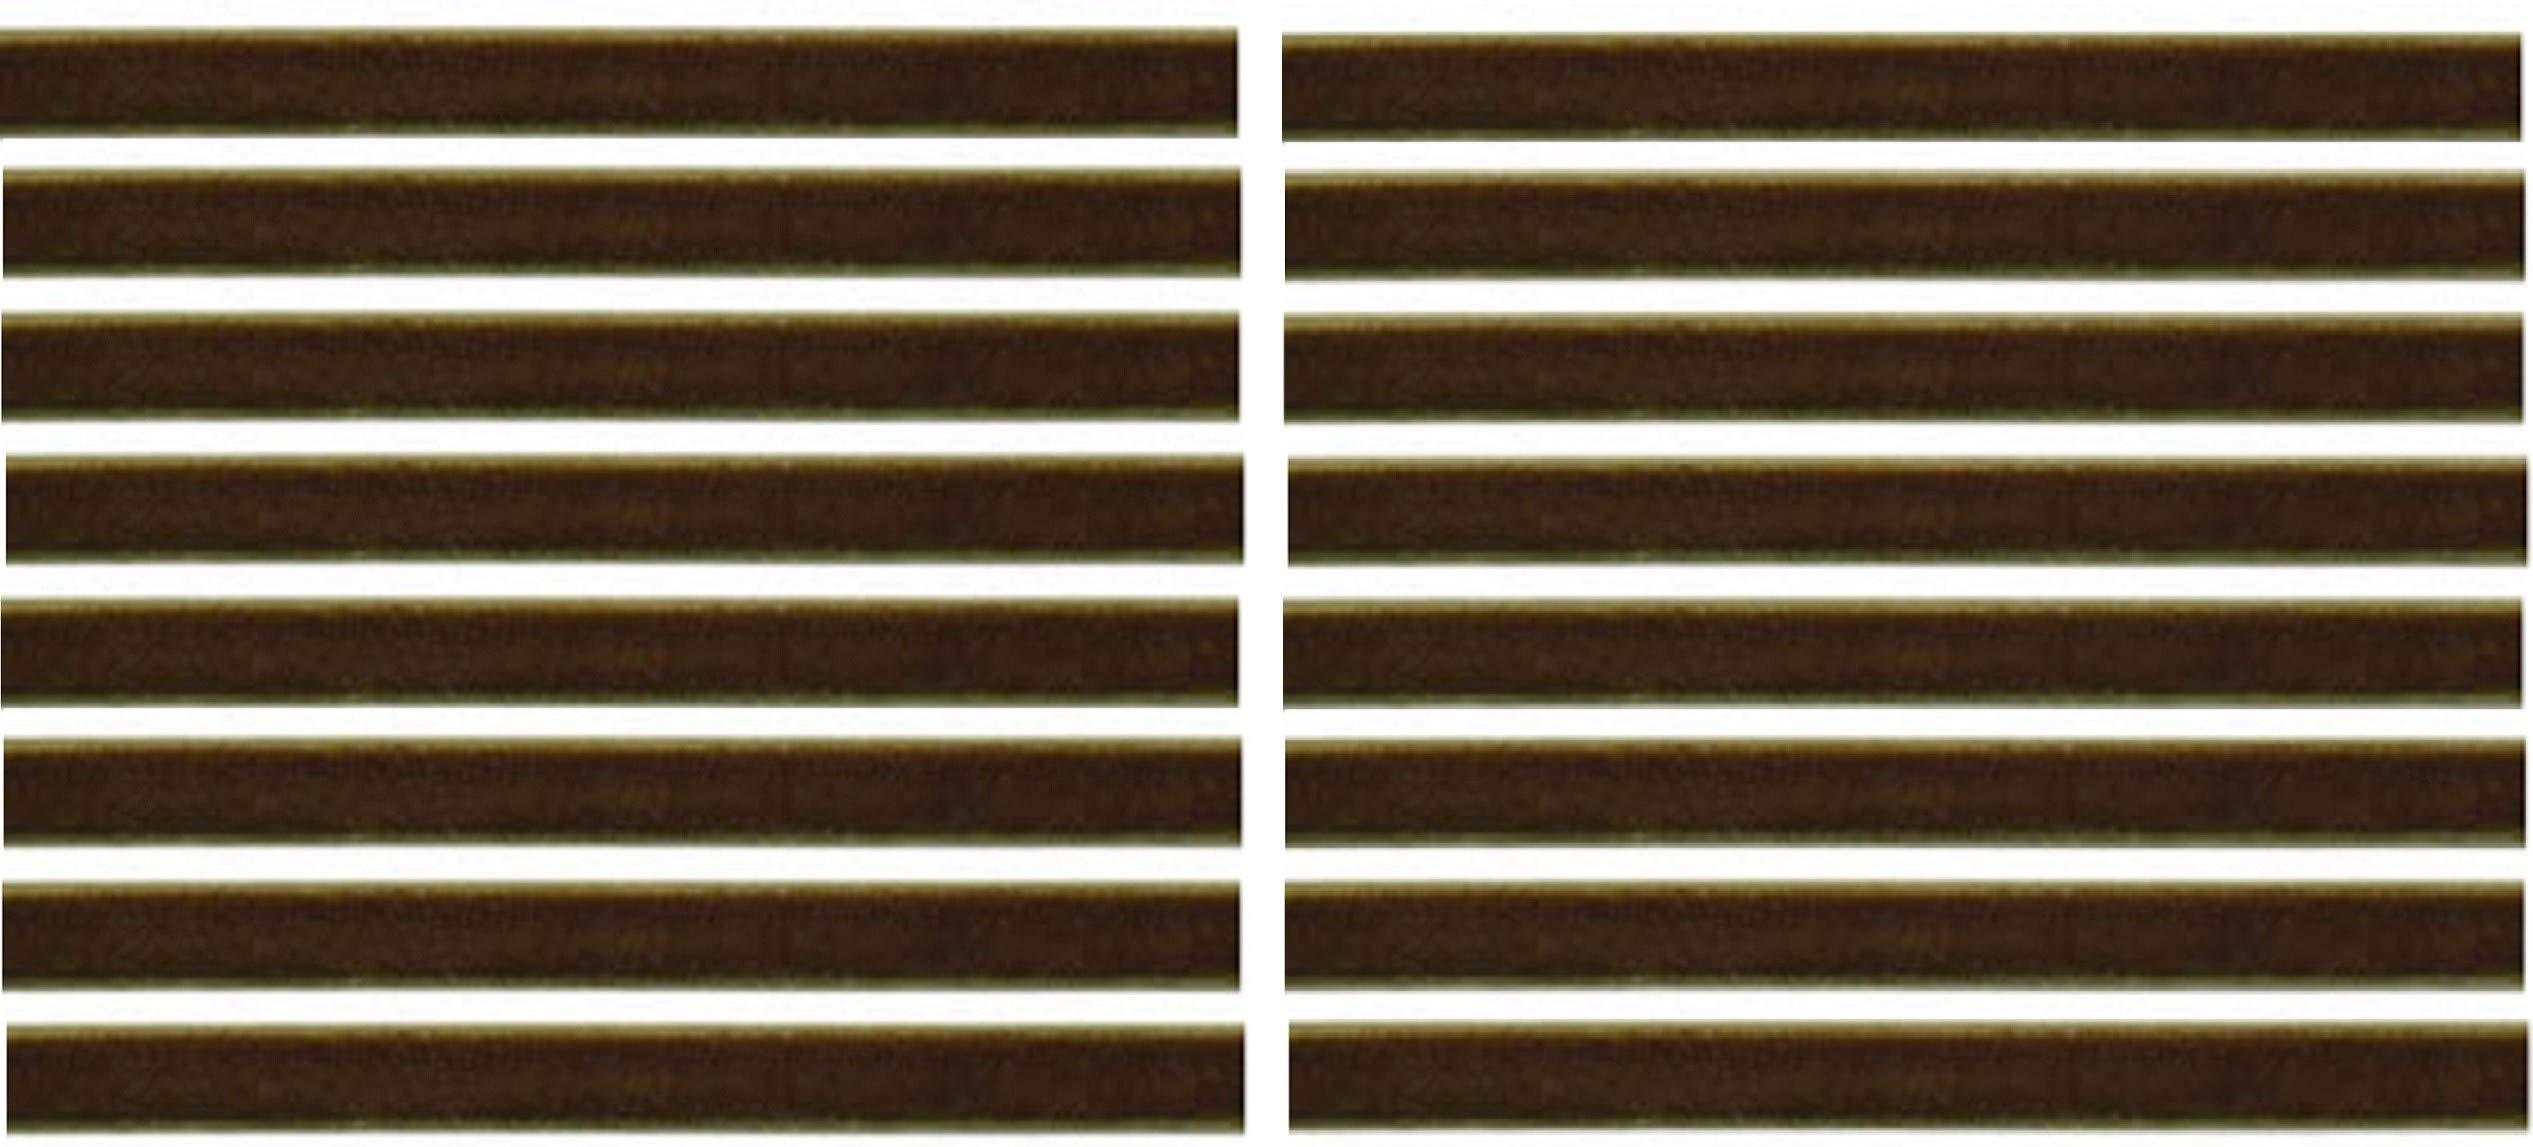 Olive Green Replacement Cleaning Strips (16-Pack) VPI Okki Nokki 3M LP Vinyl Record Album